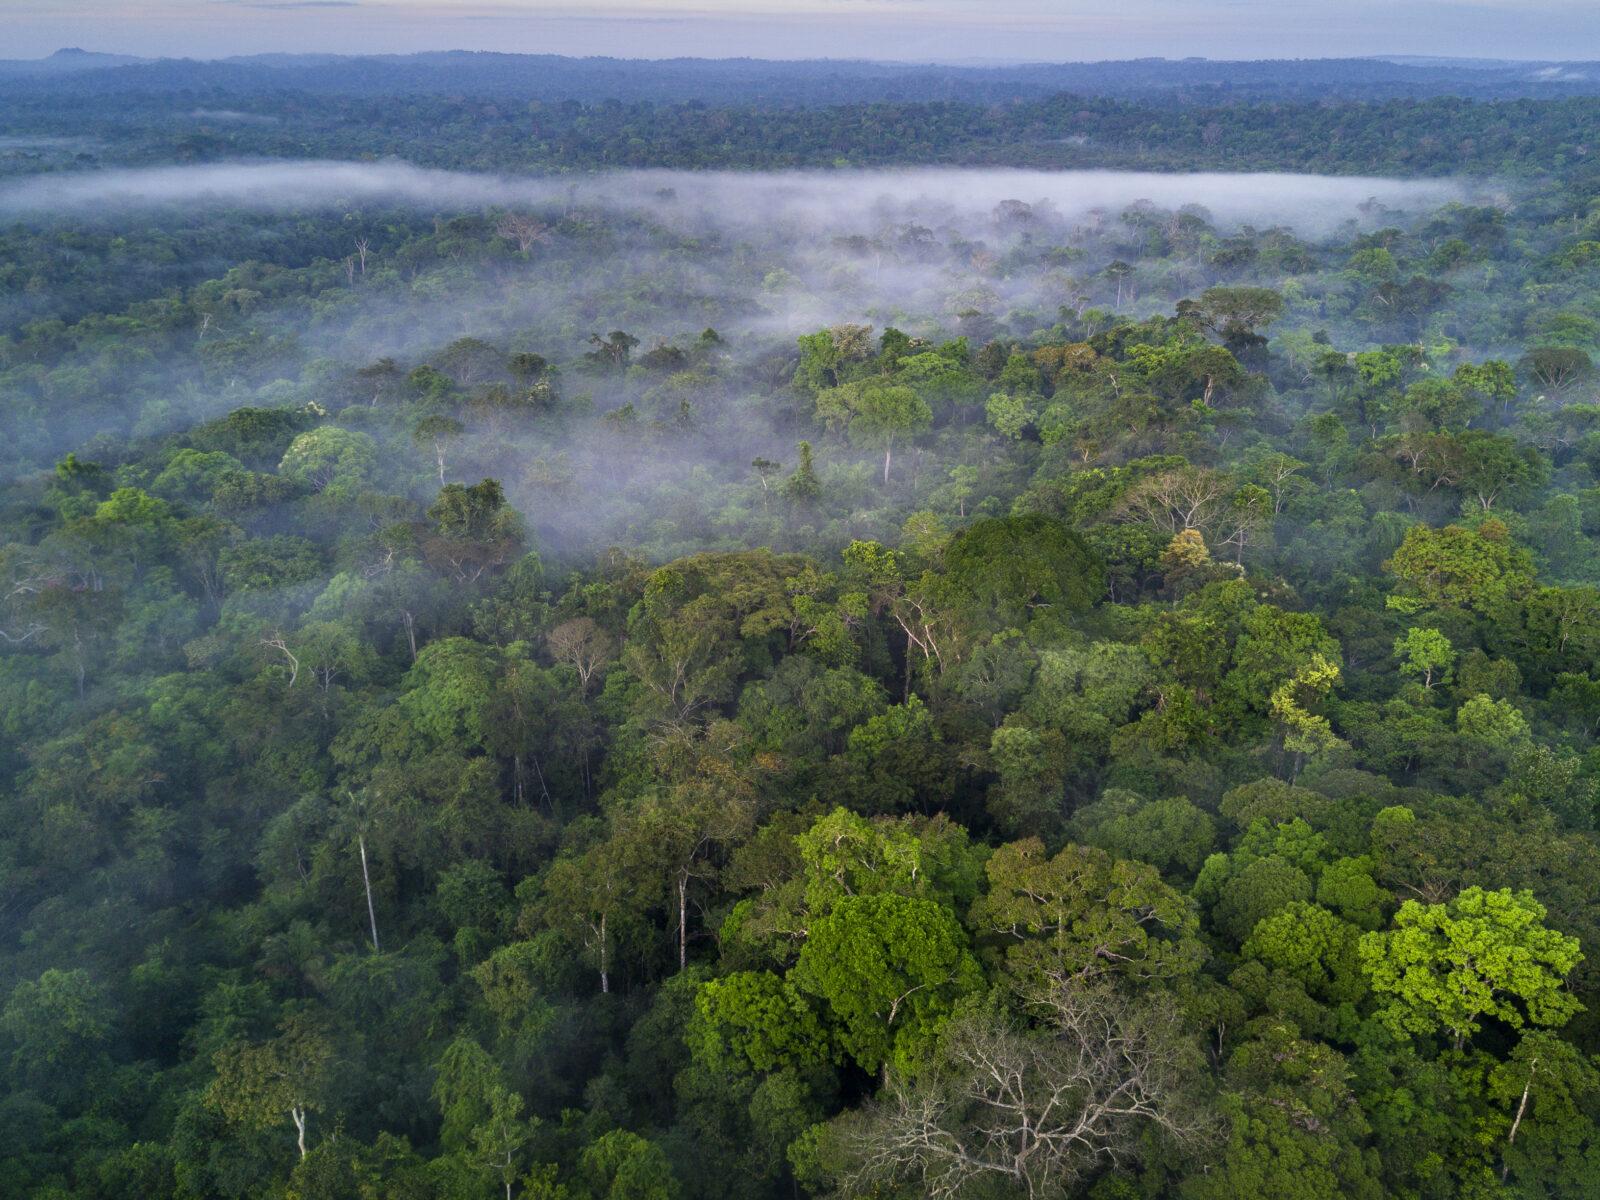 Amazonas, Regnskog, tropisk skog, global, Skog, Brasilien, Brazil, Rainforest